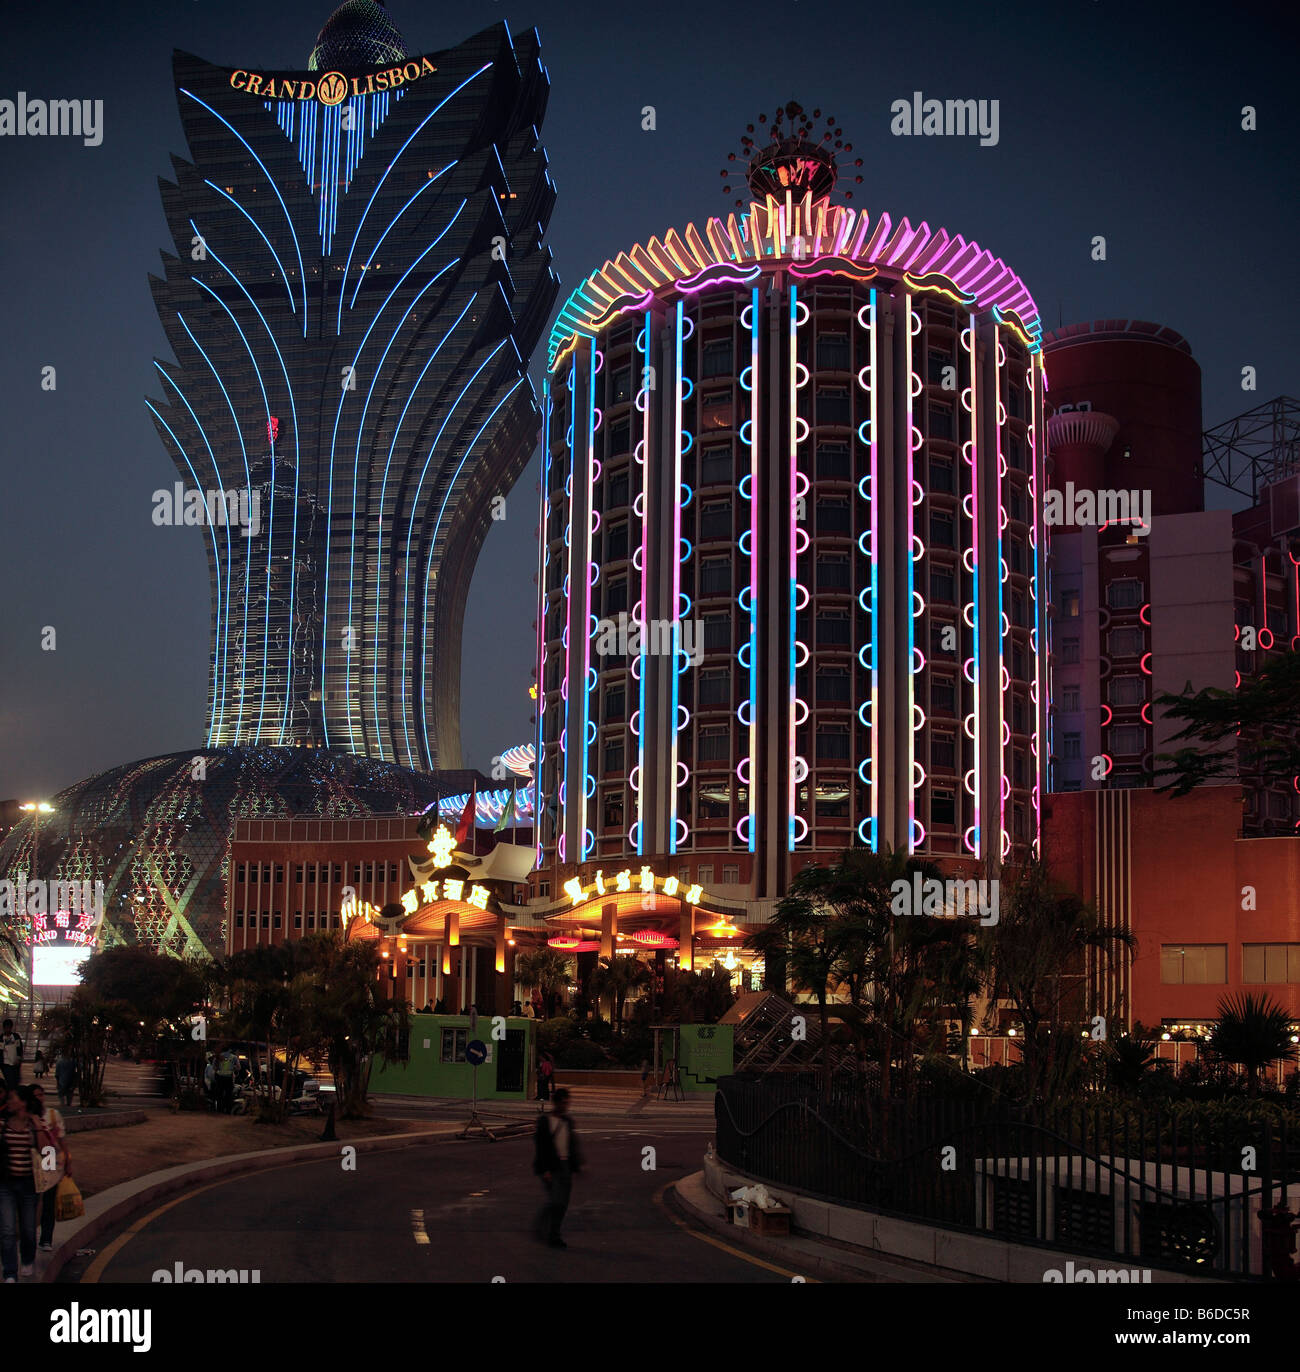 Chine Macao Grand Lisboa Lisboa et casinos à nuit Photo Stock